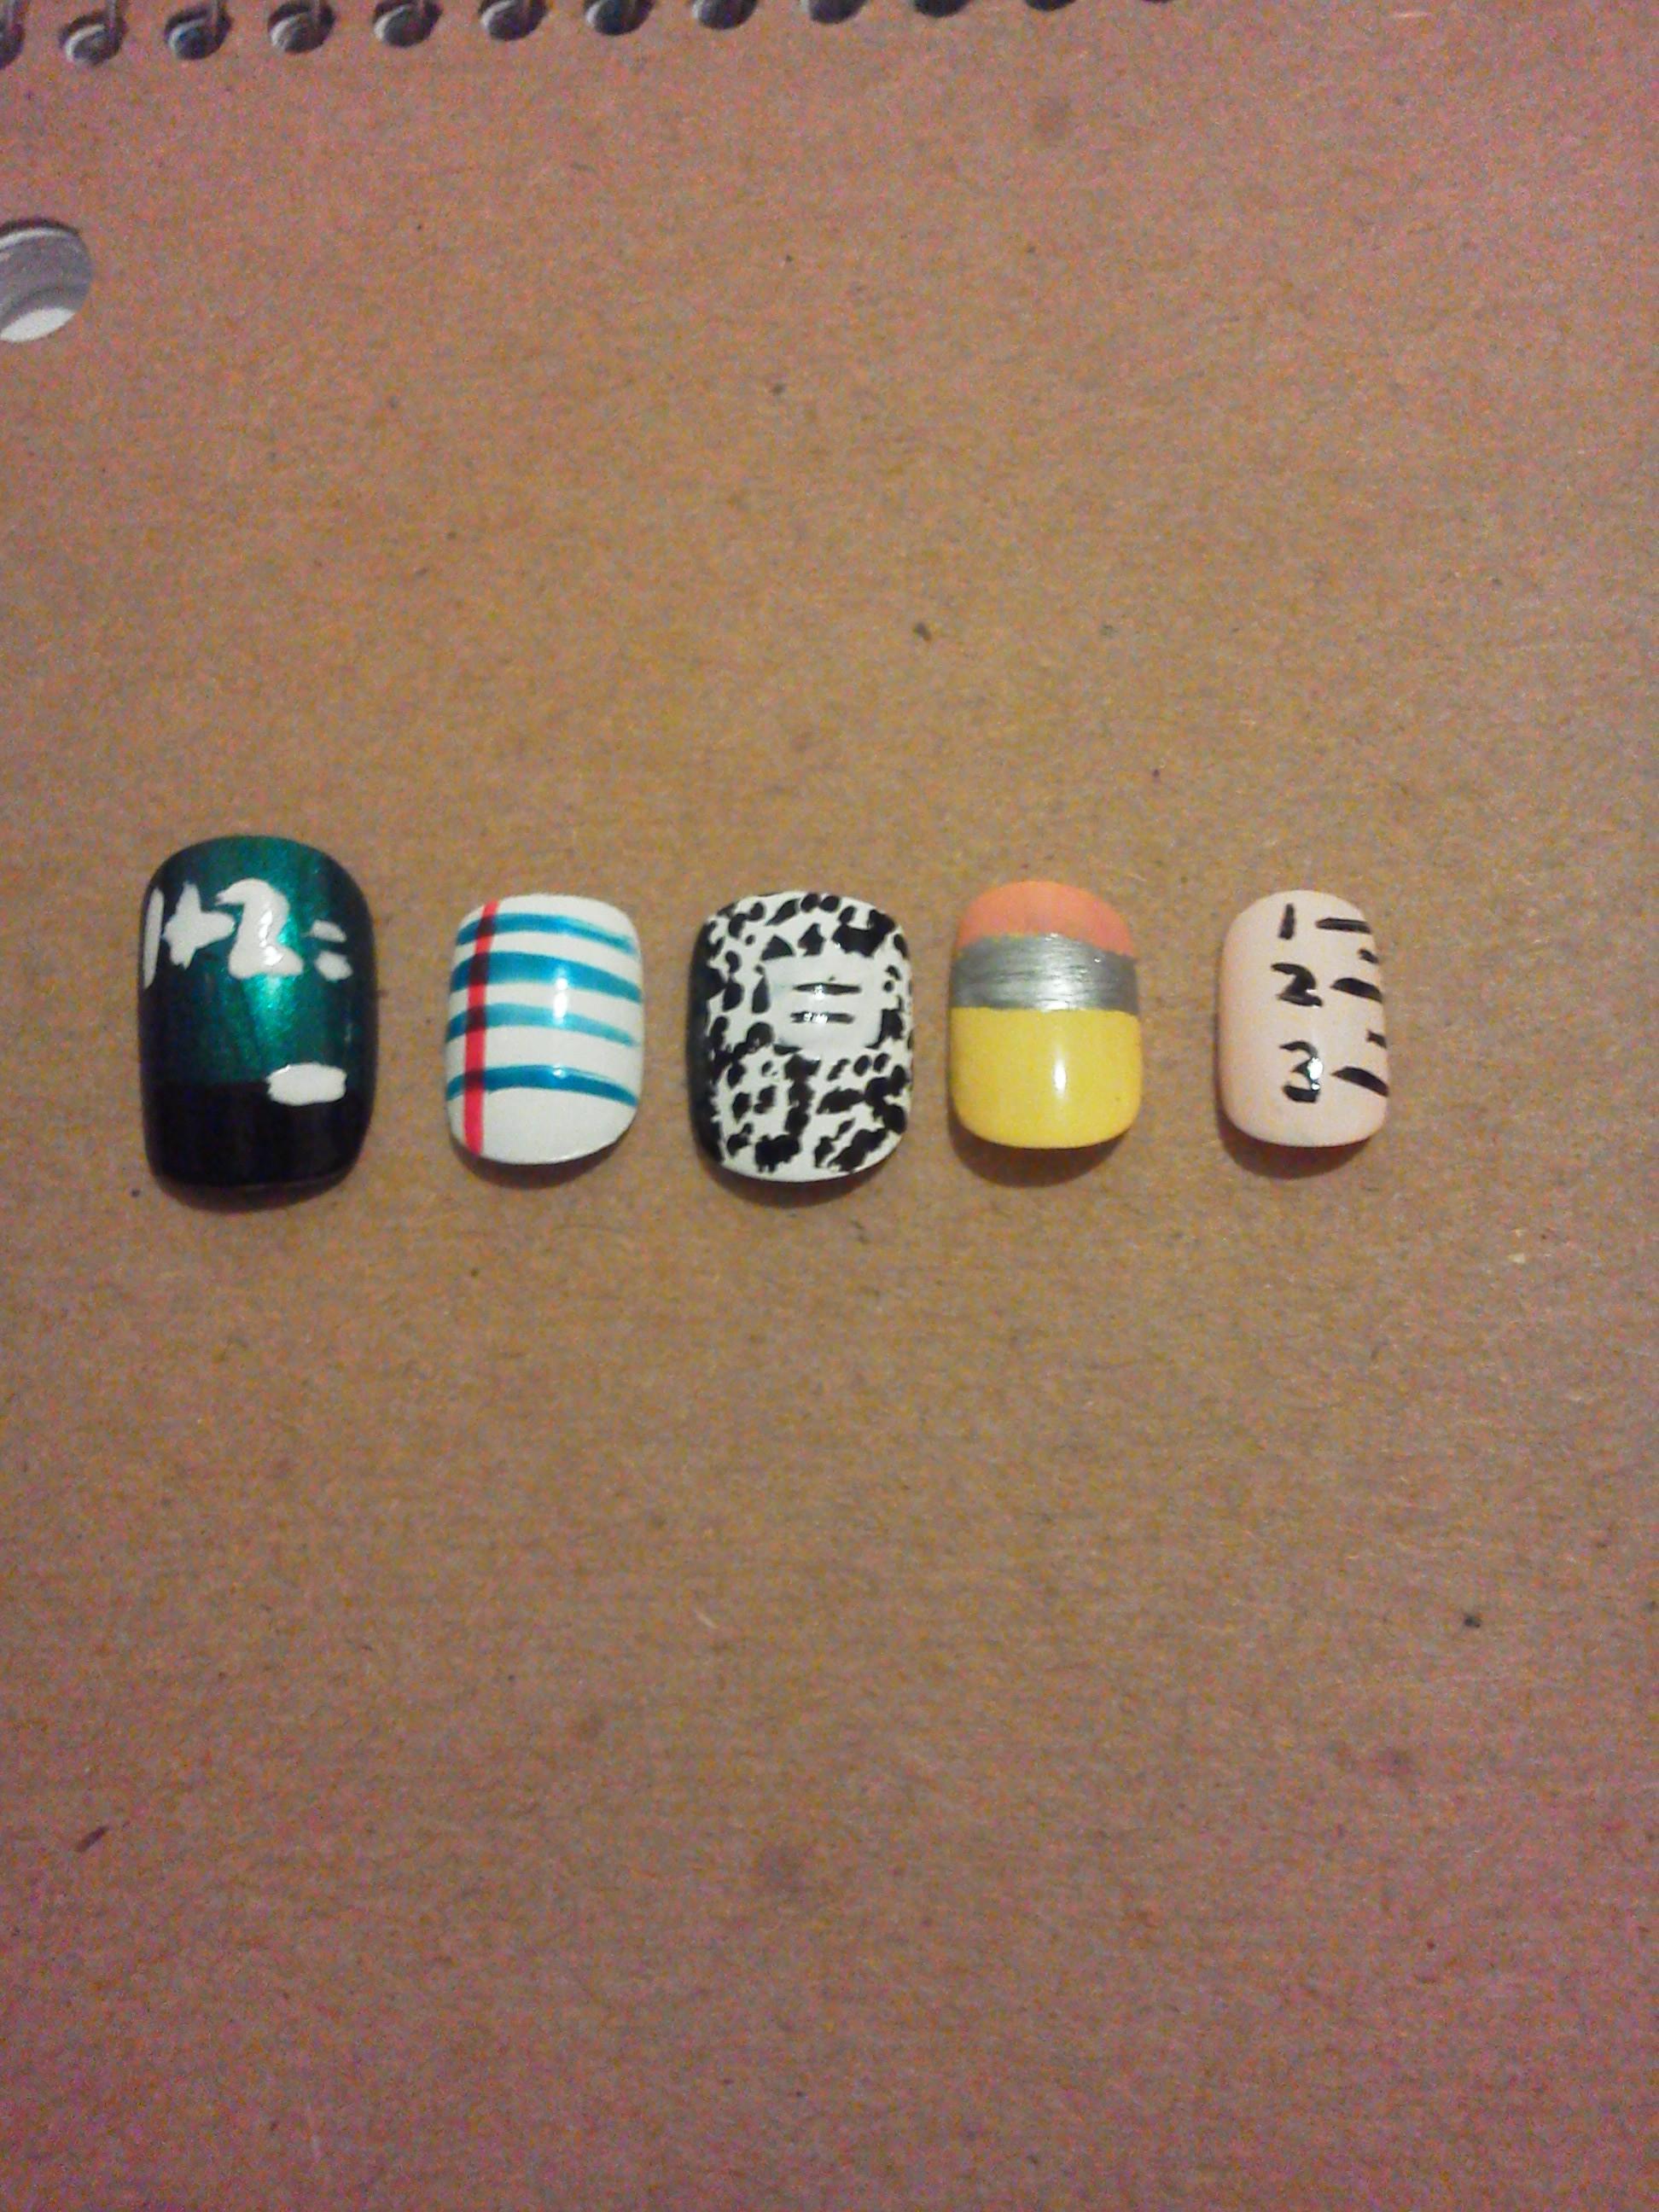 Back to school nail art (no flash